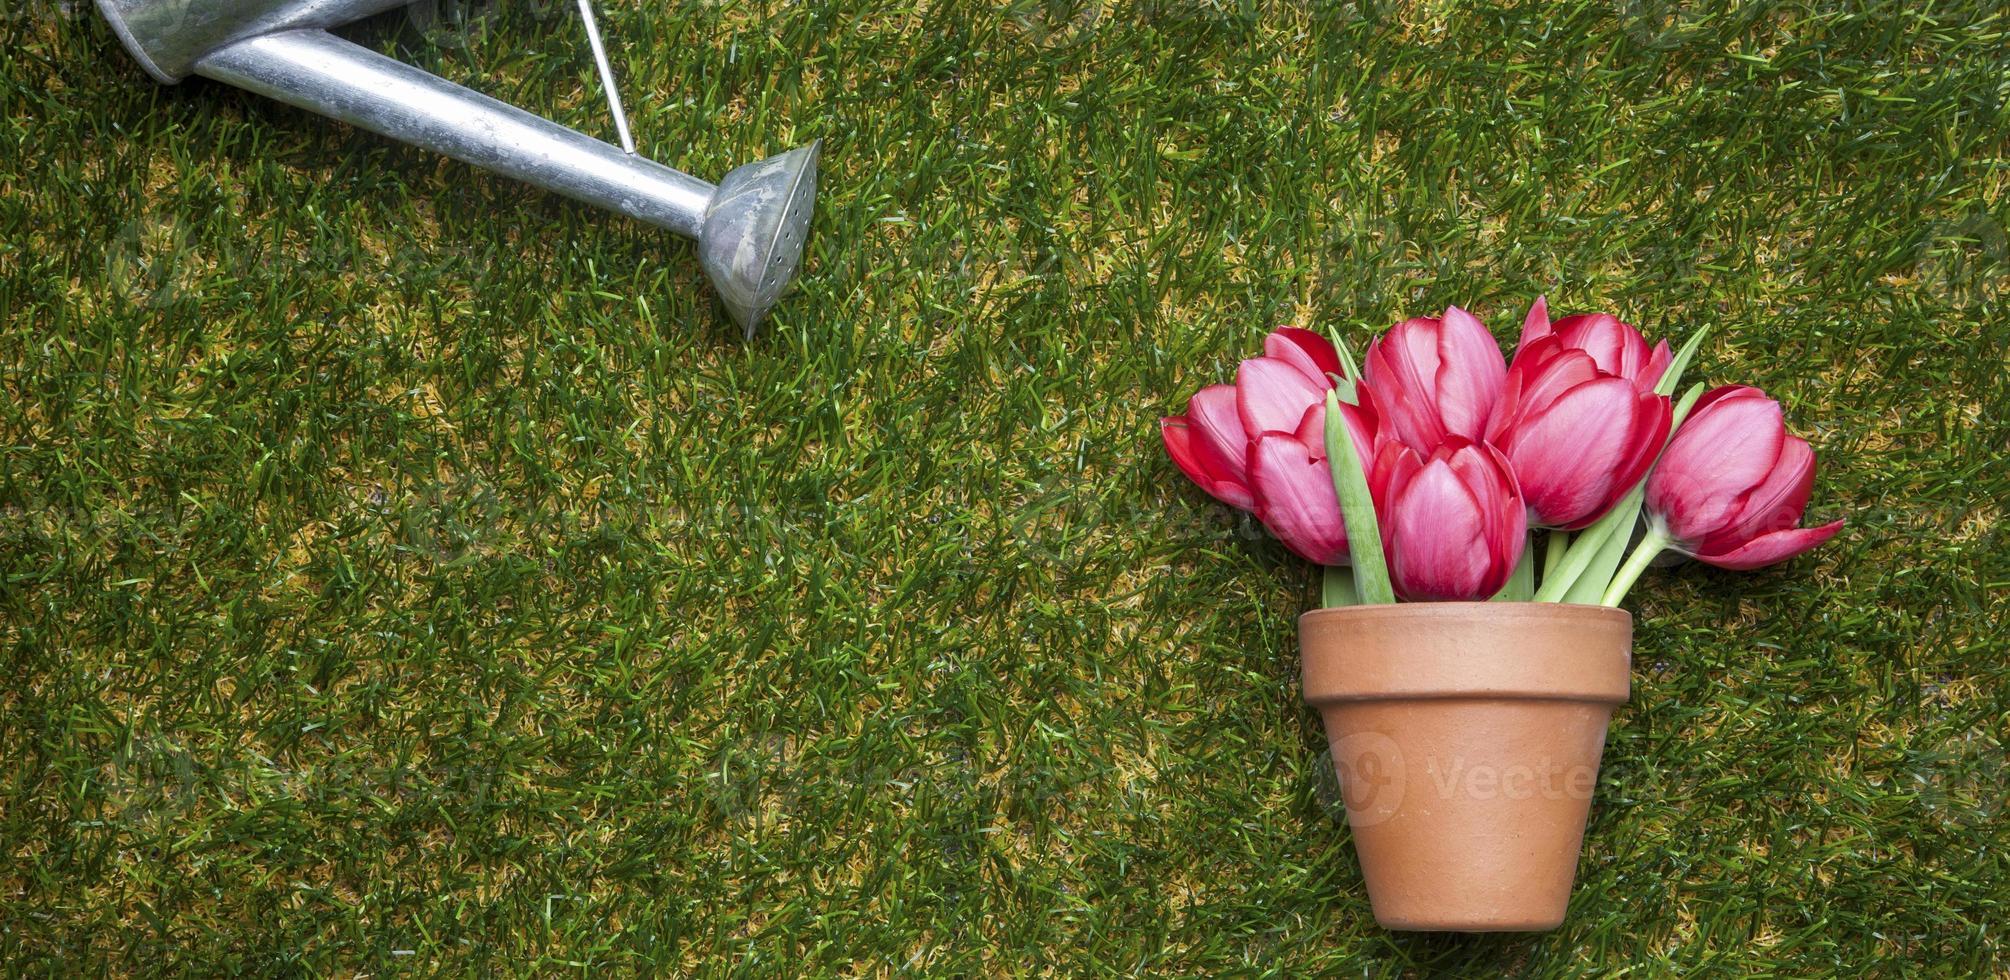 Blumentopf mit Tulpen auf Gras, Kopierraum foto